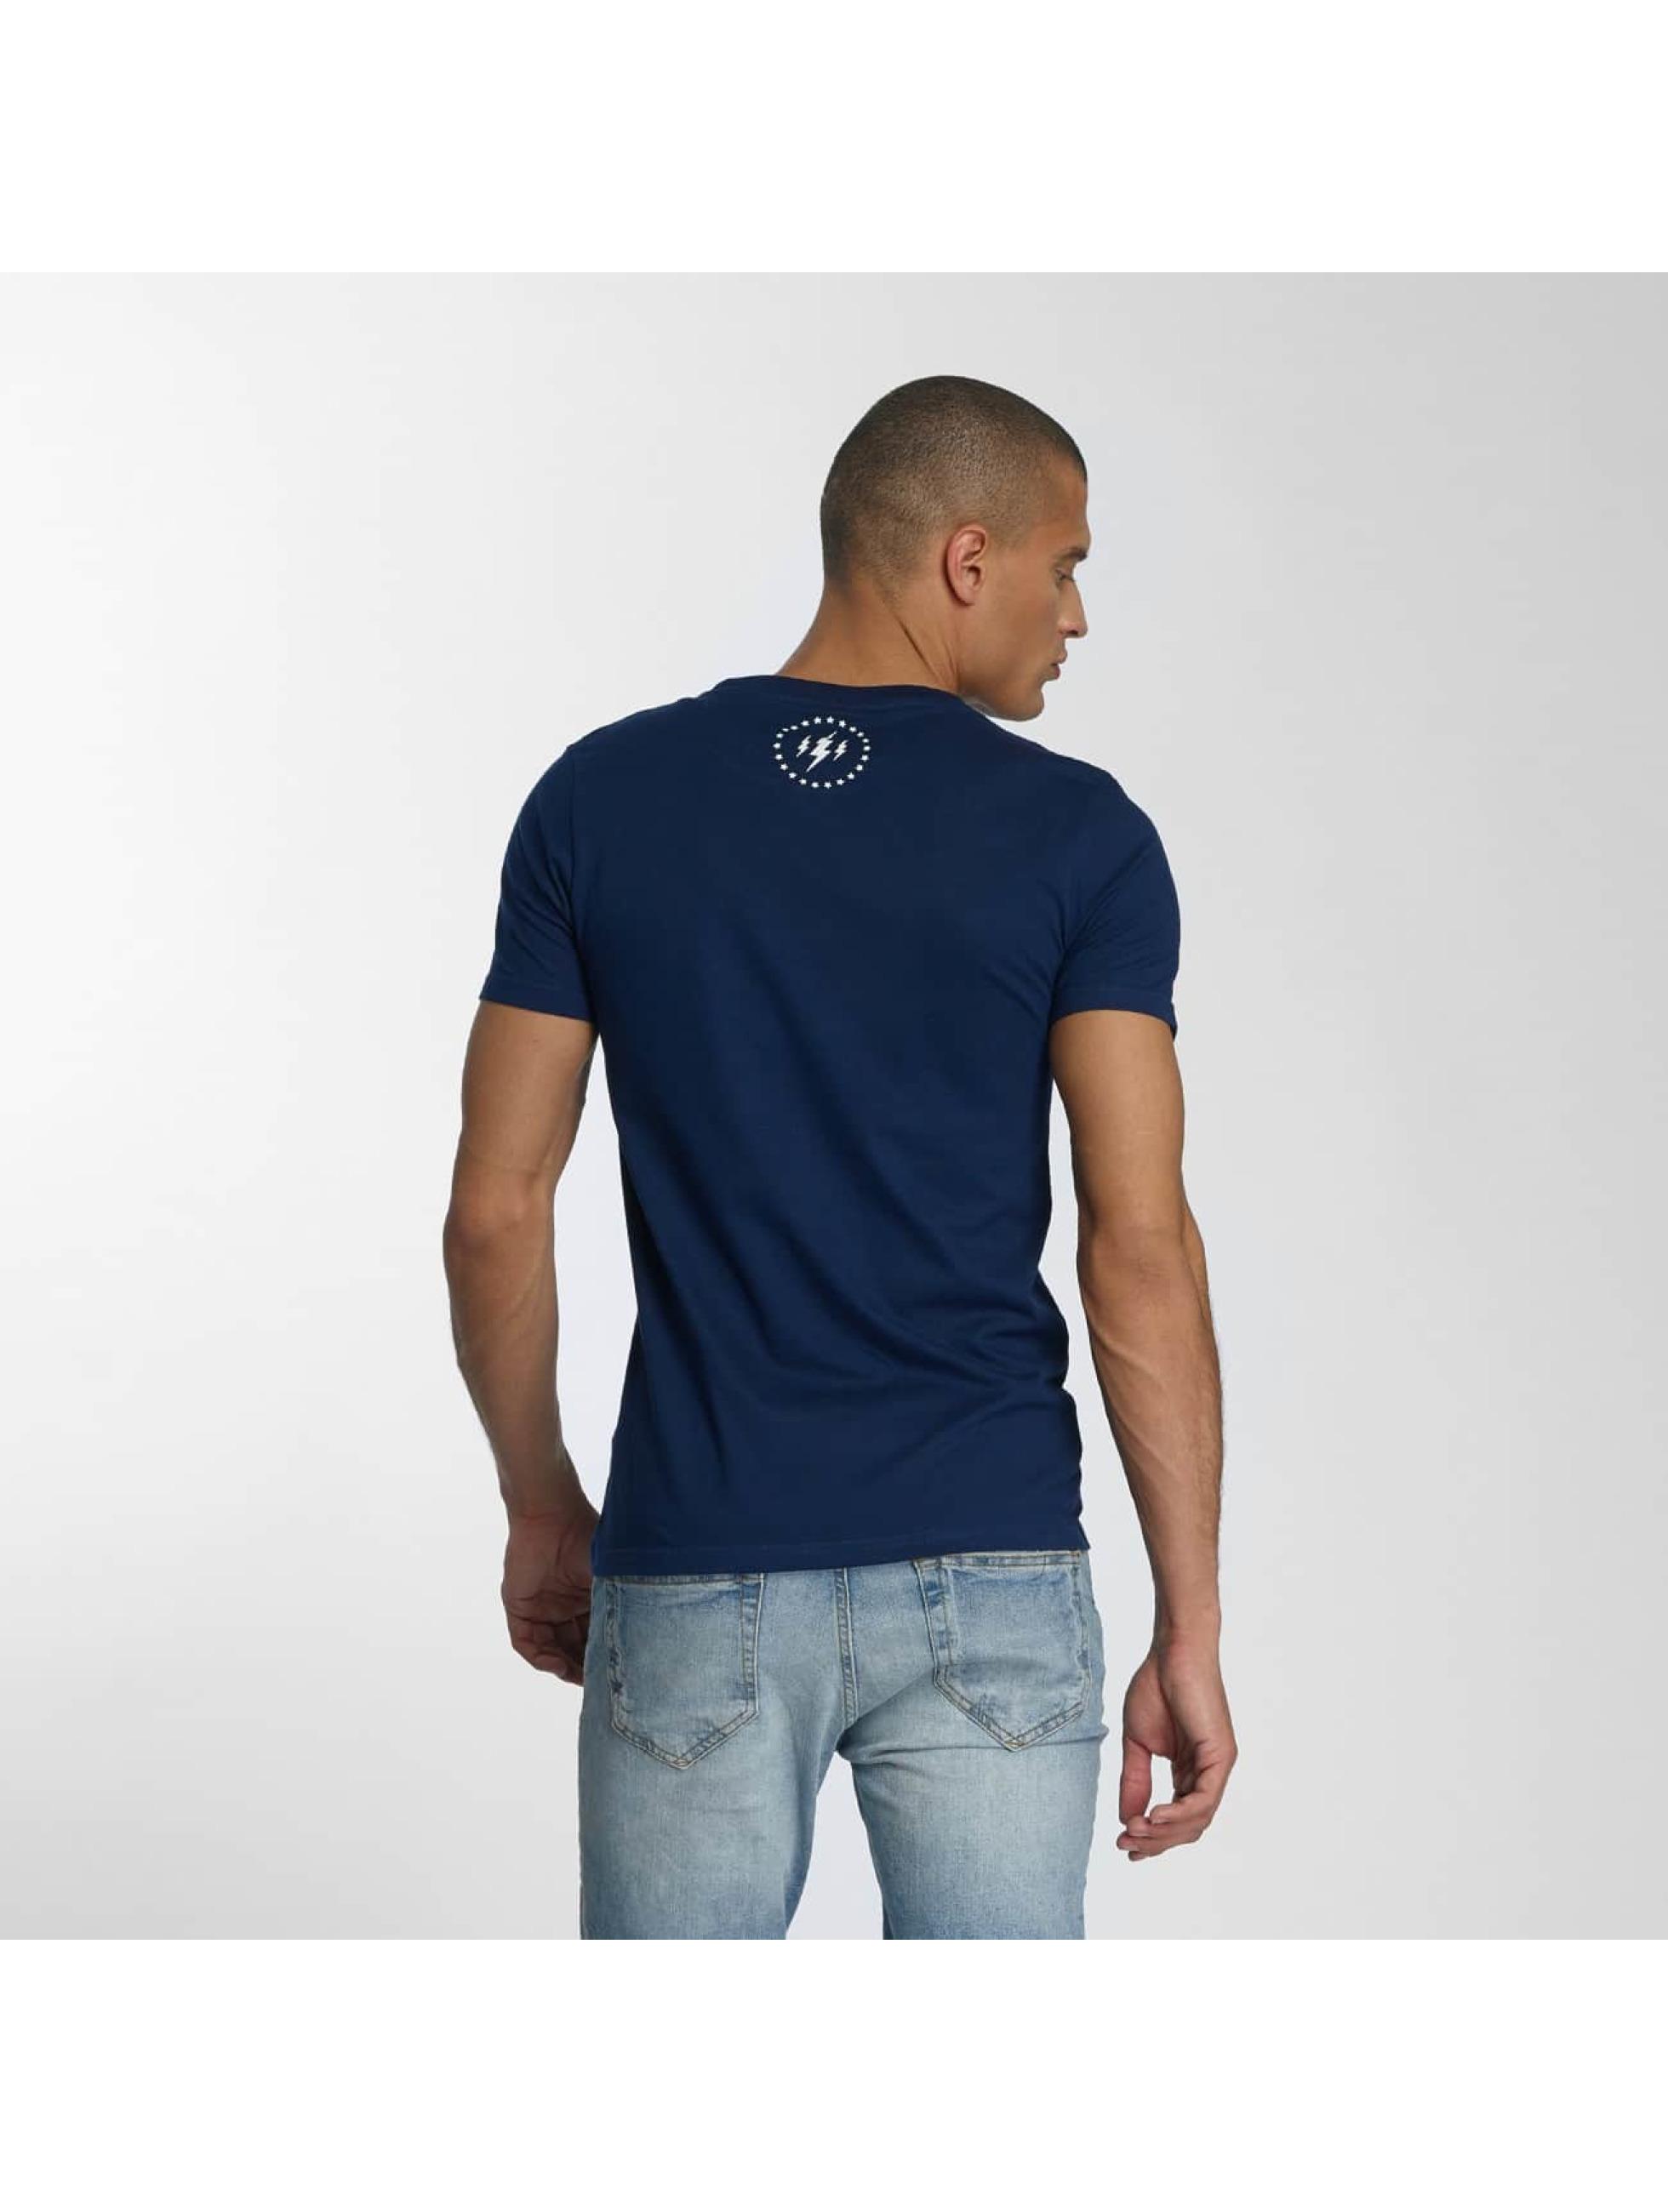 TrueSpin T-Shirt 2 blau